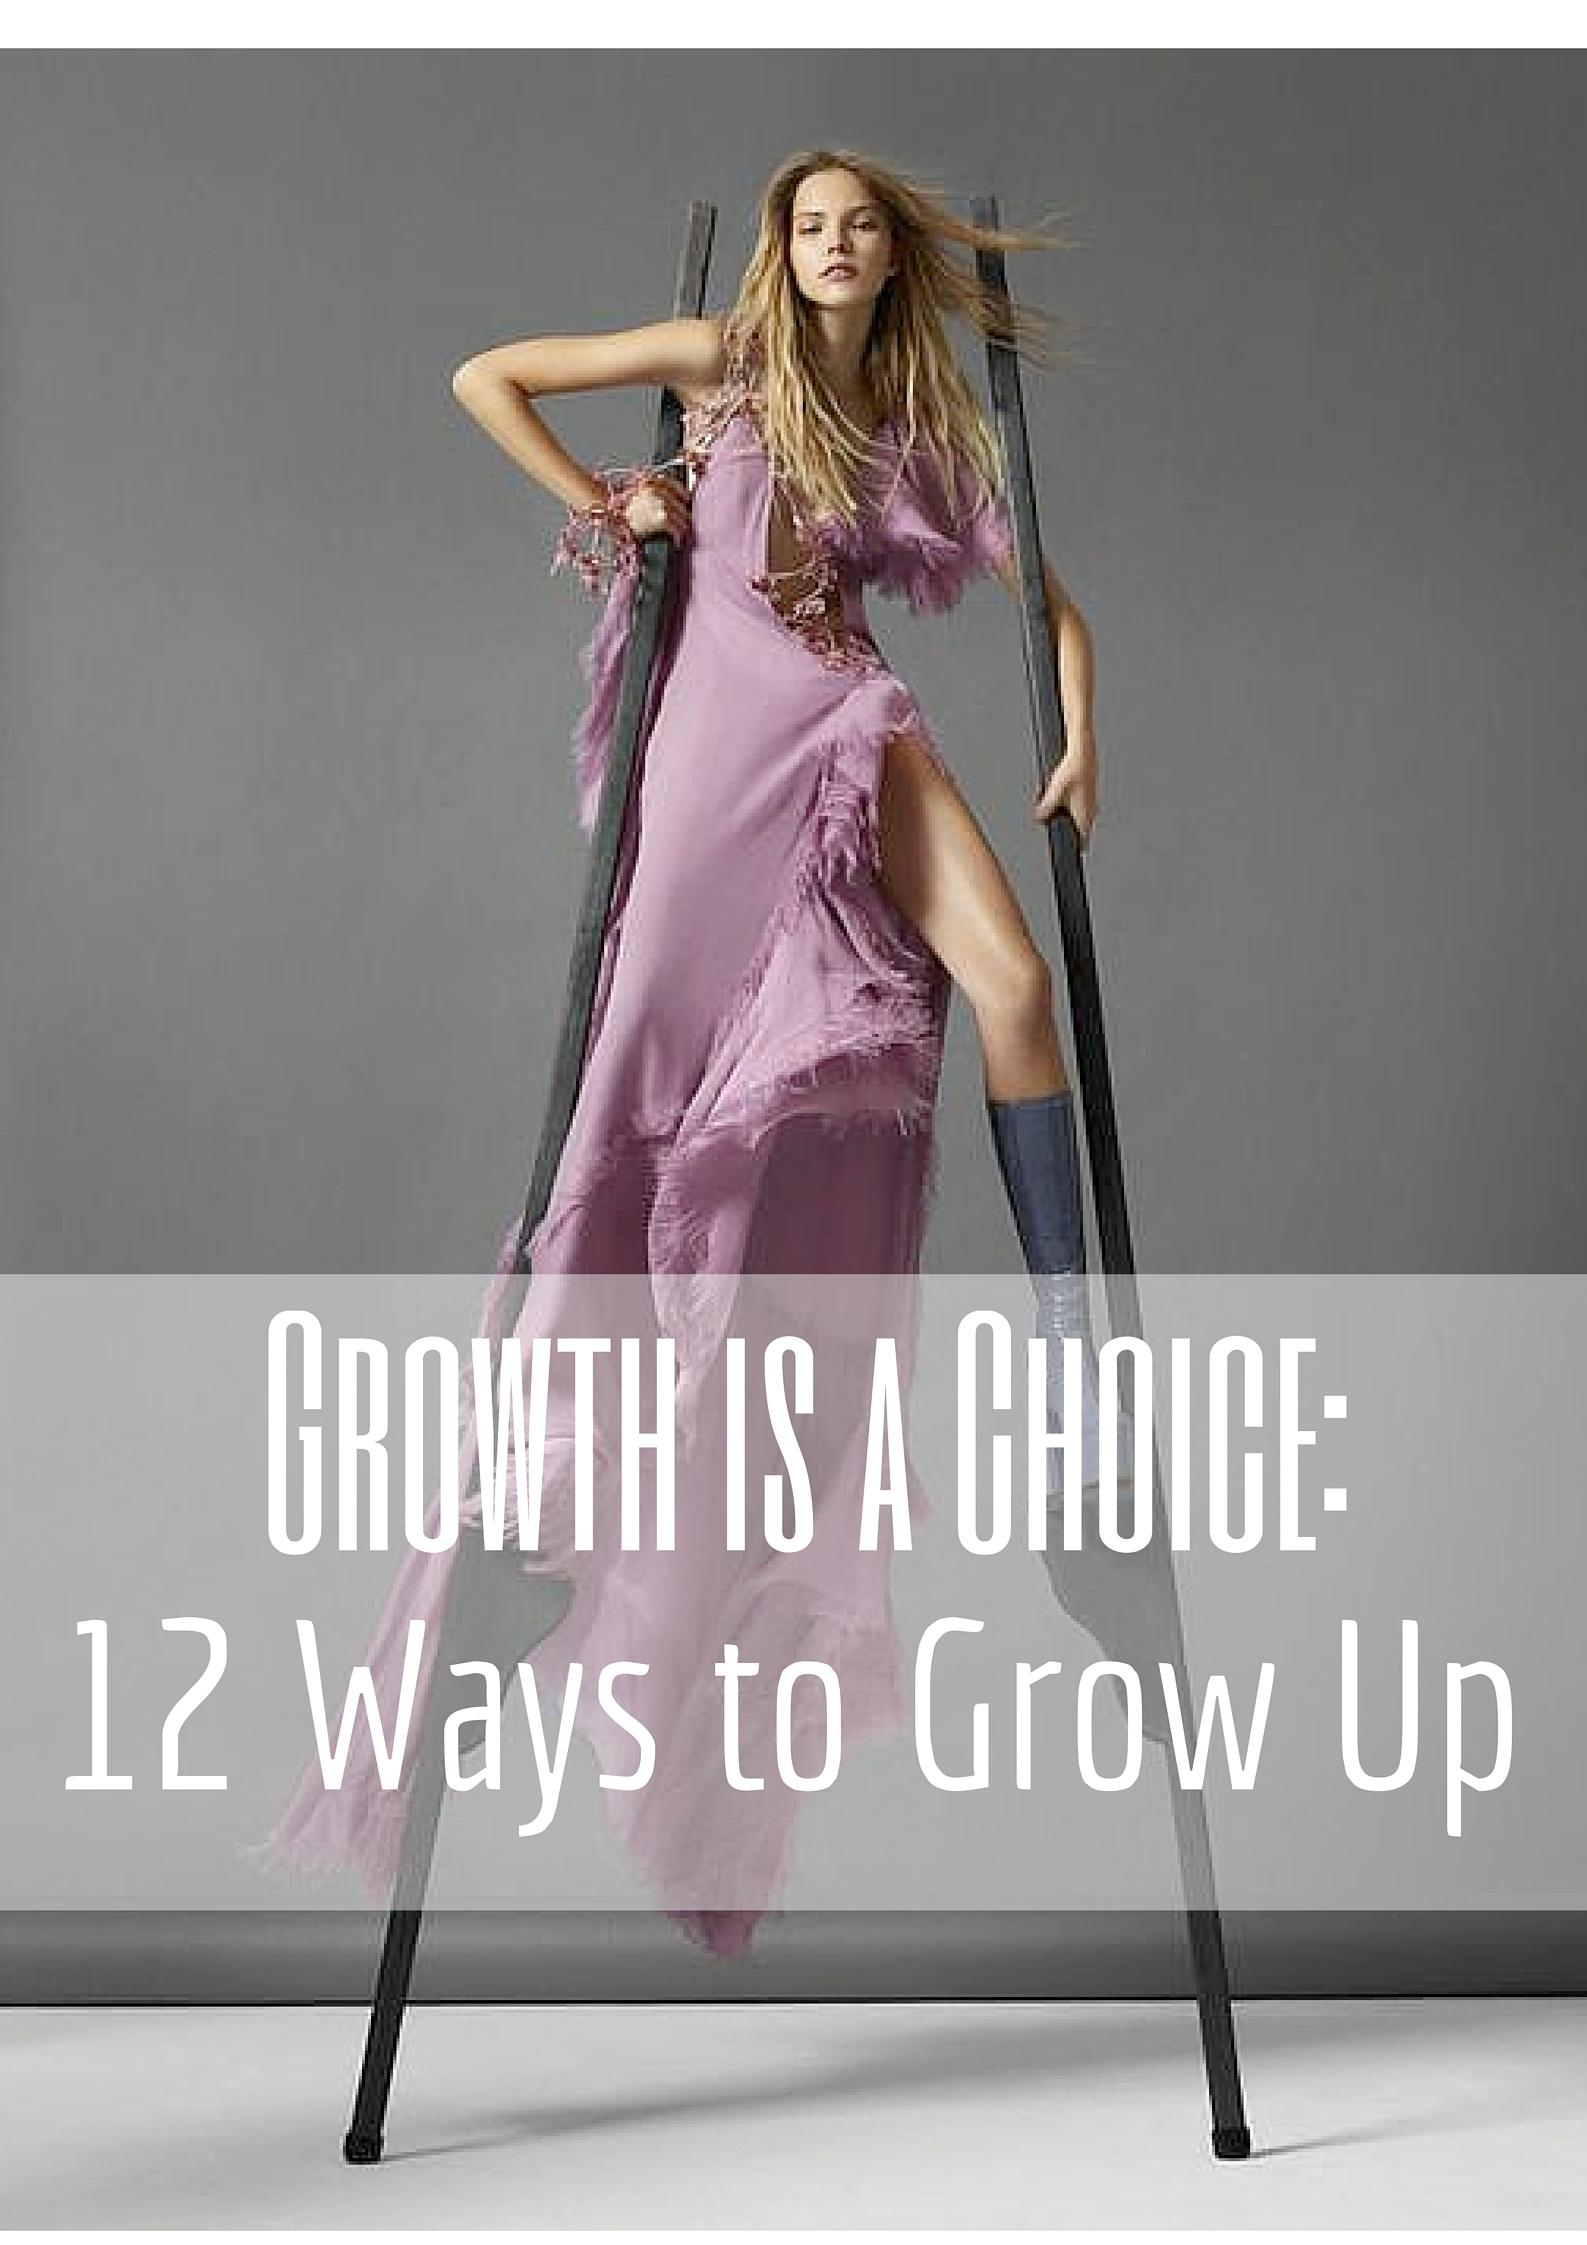 Hard life growing up